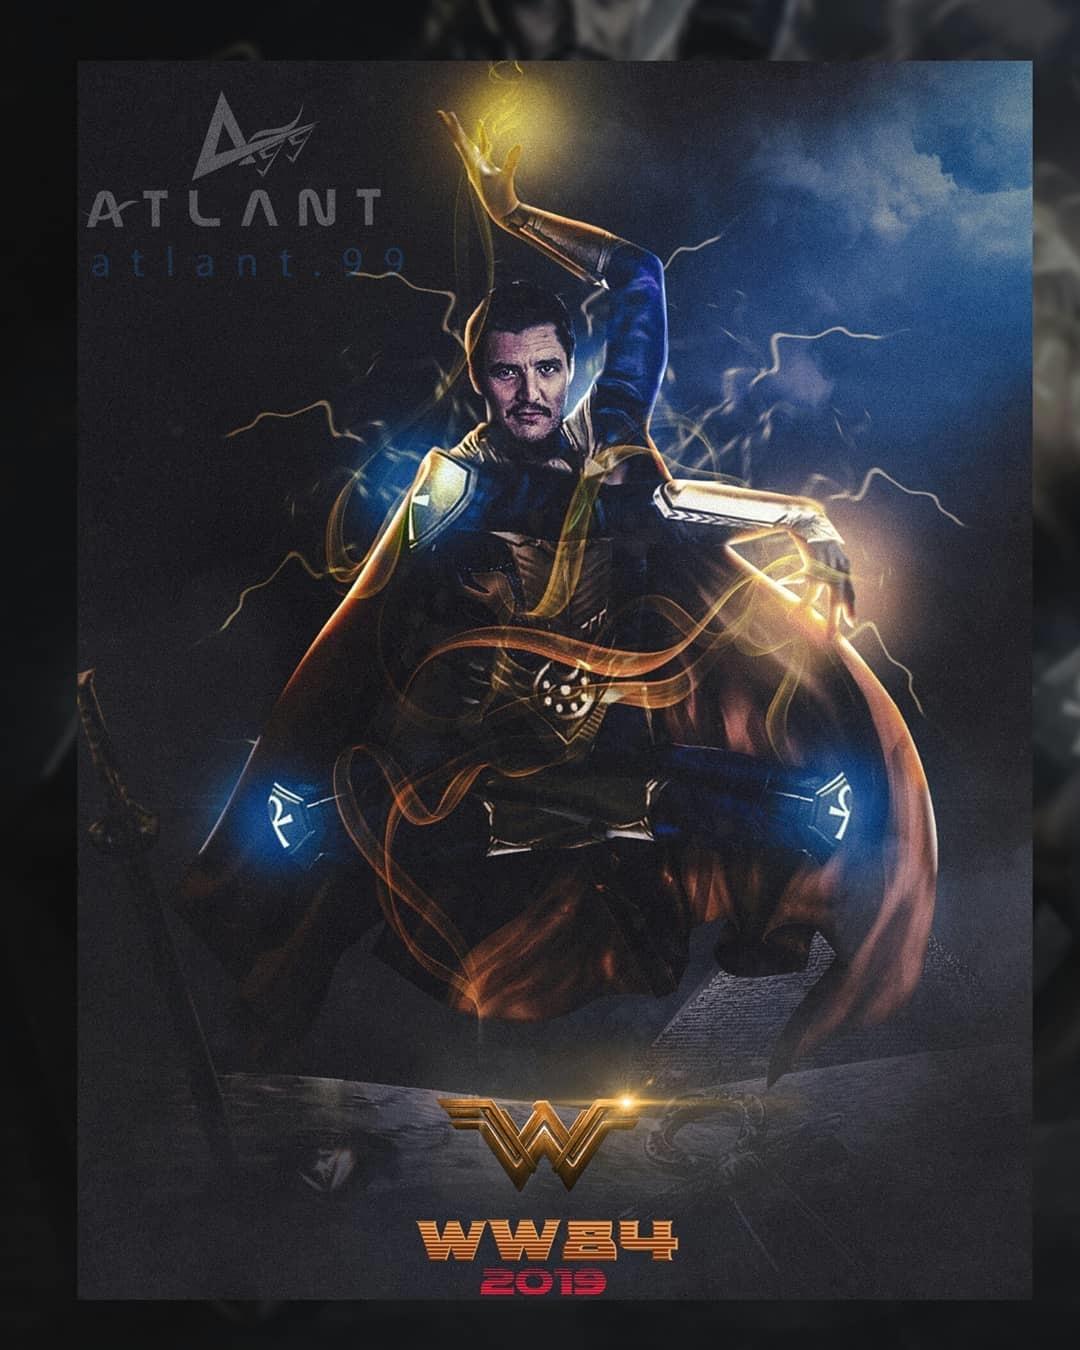 Wonder Woman 2 fan art depicting Pedro Pascal as Doctor Fate